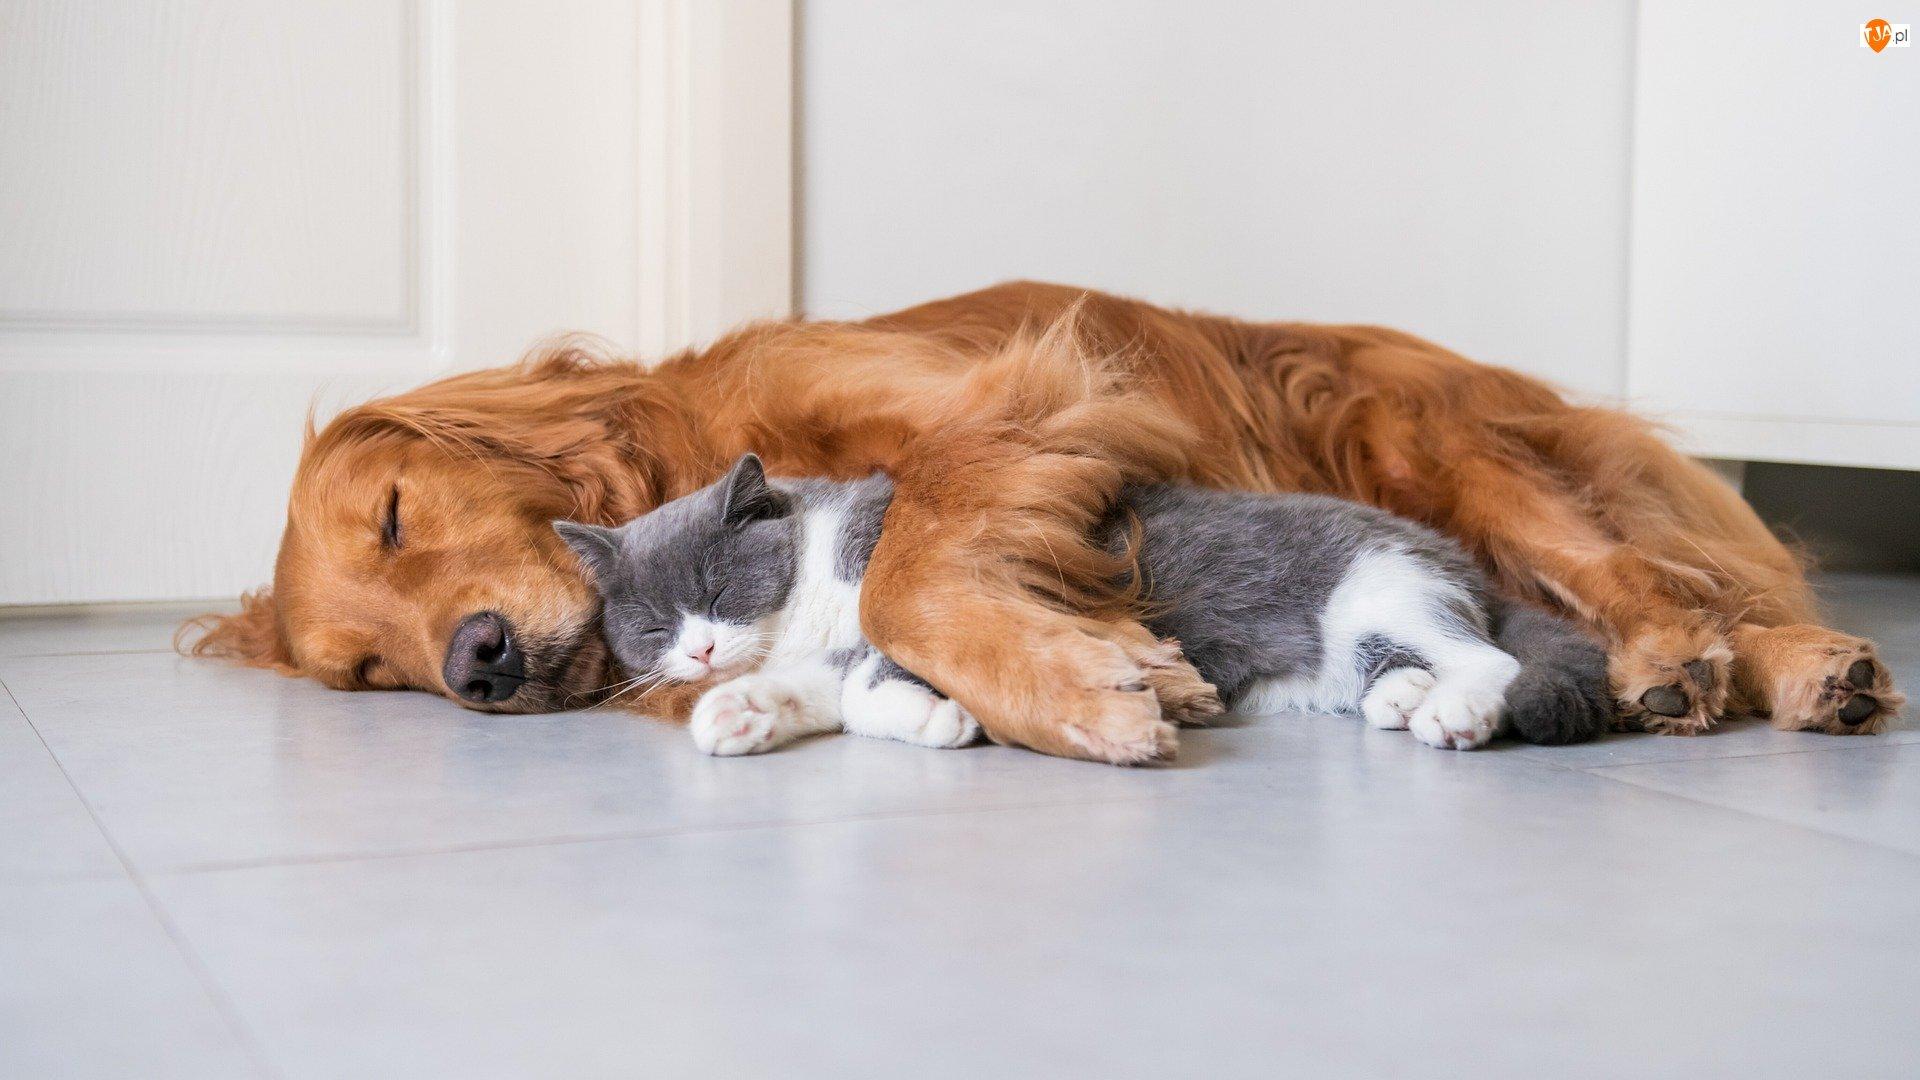 Pies, Podłoga, Rudy, Śpiący, Kot